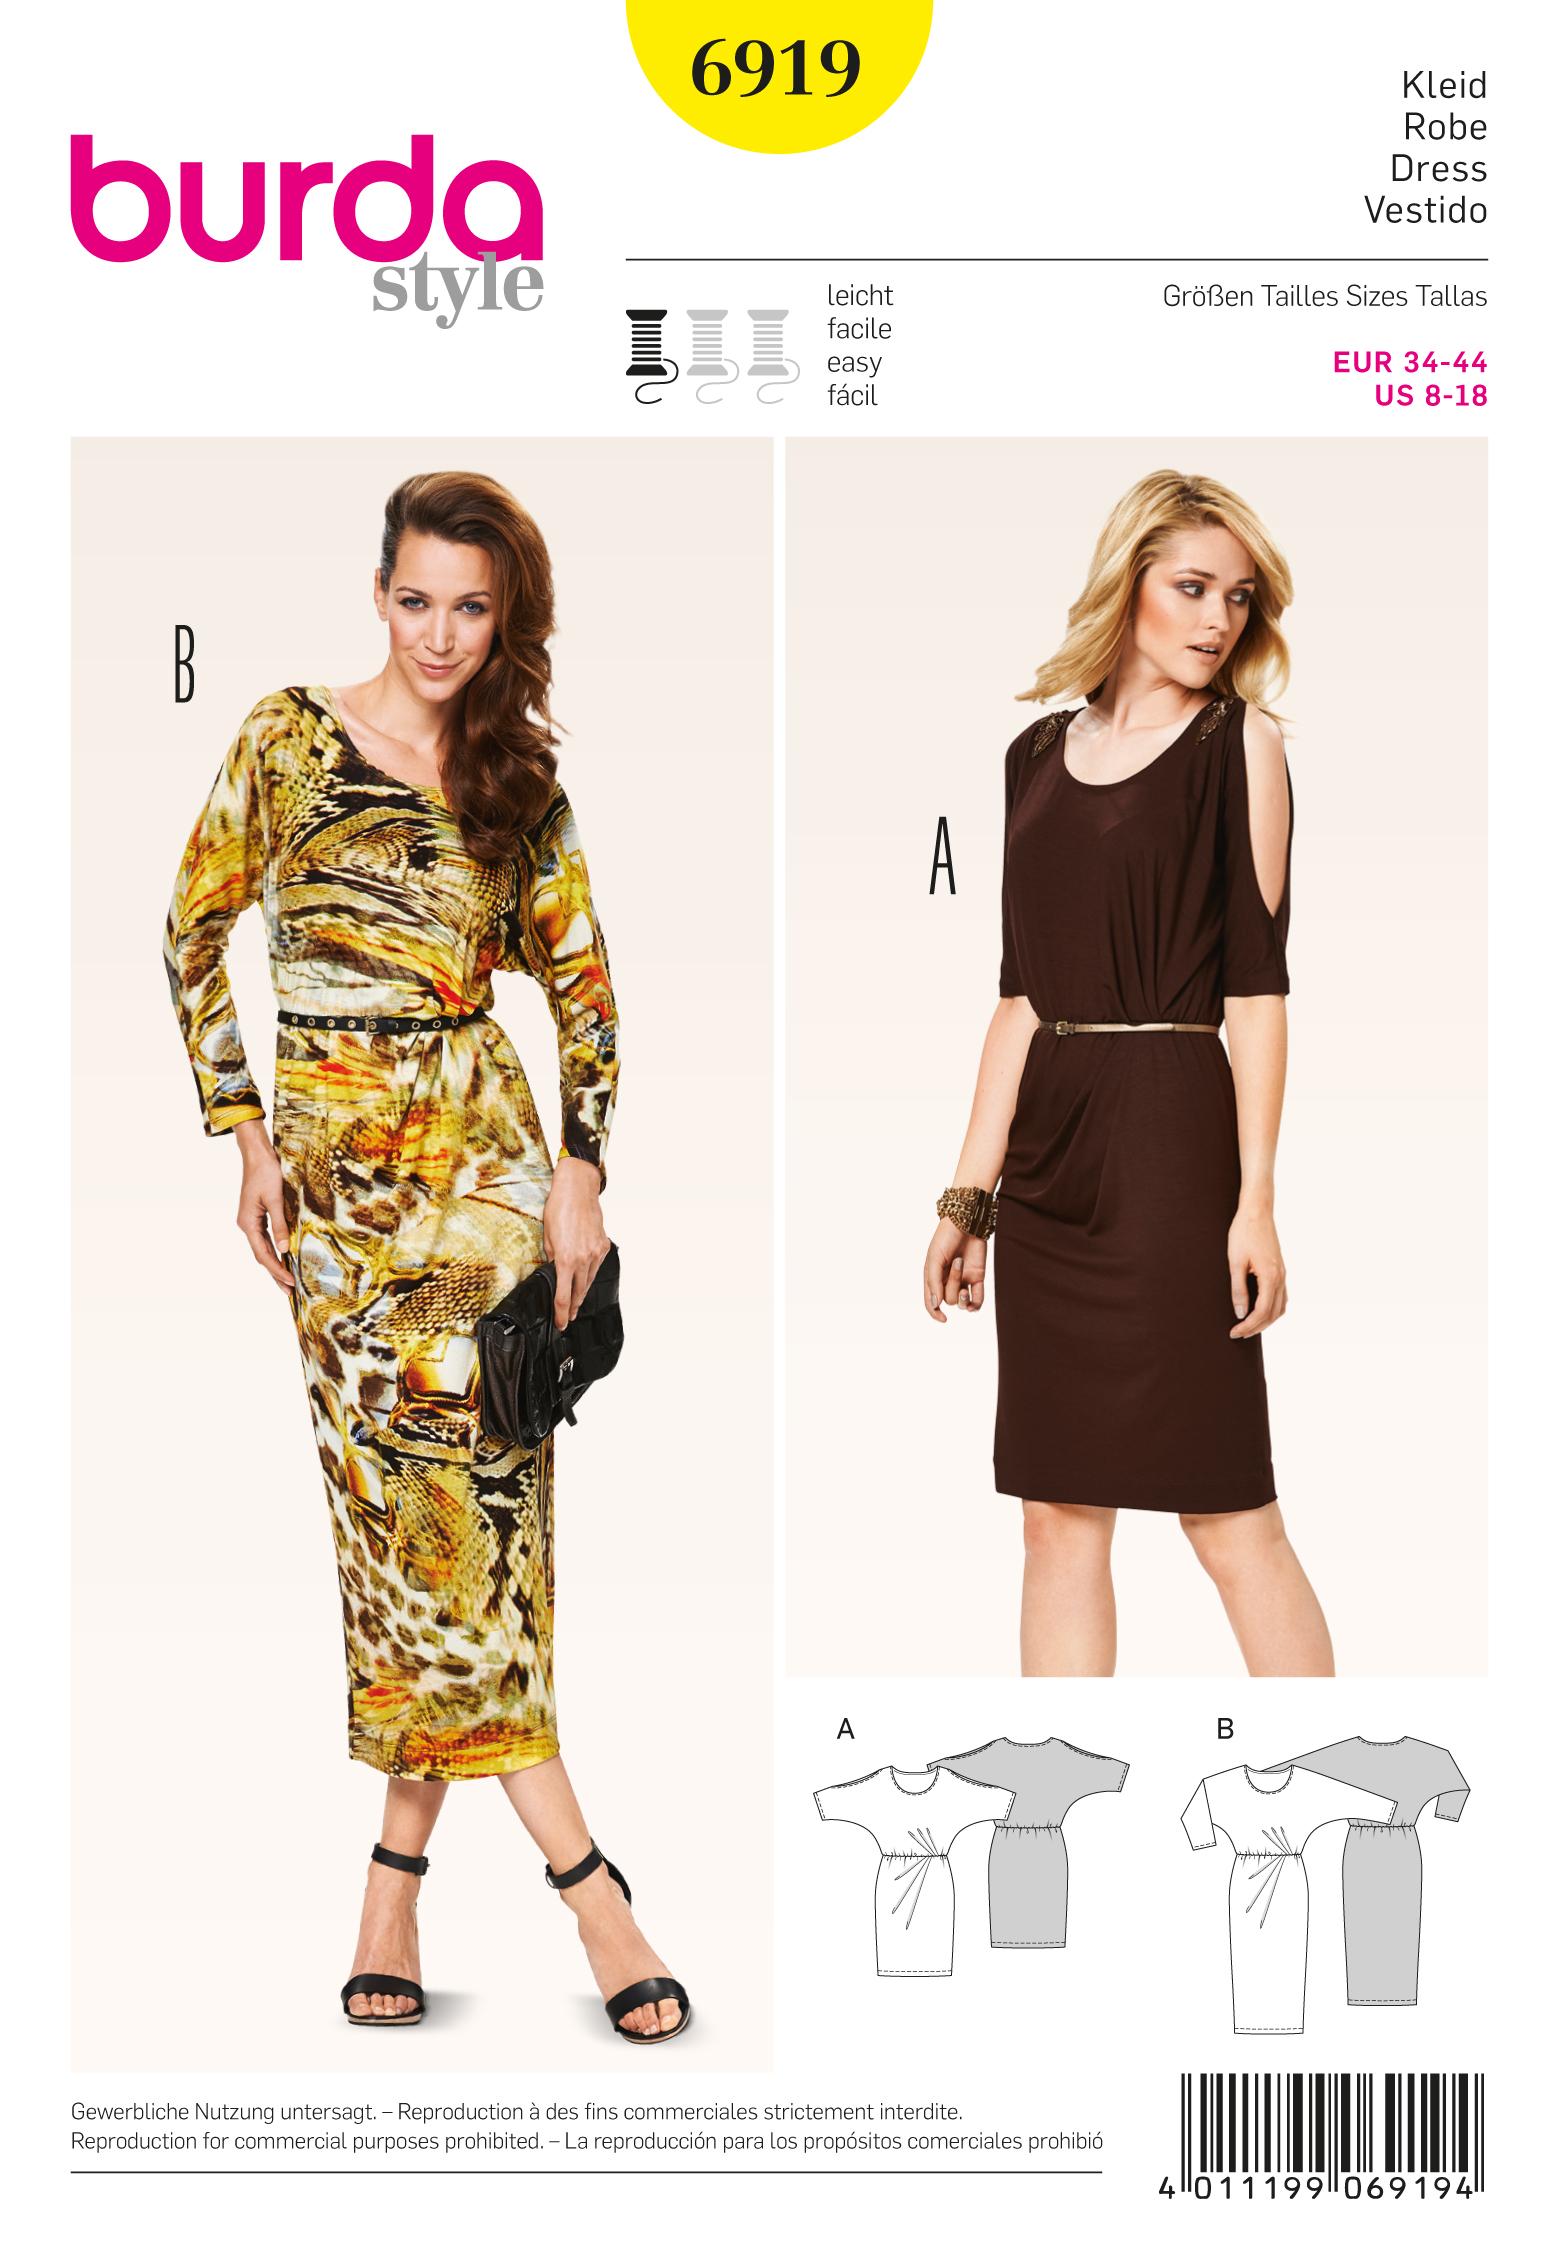 Burda Dresses 6919